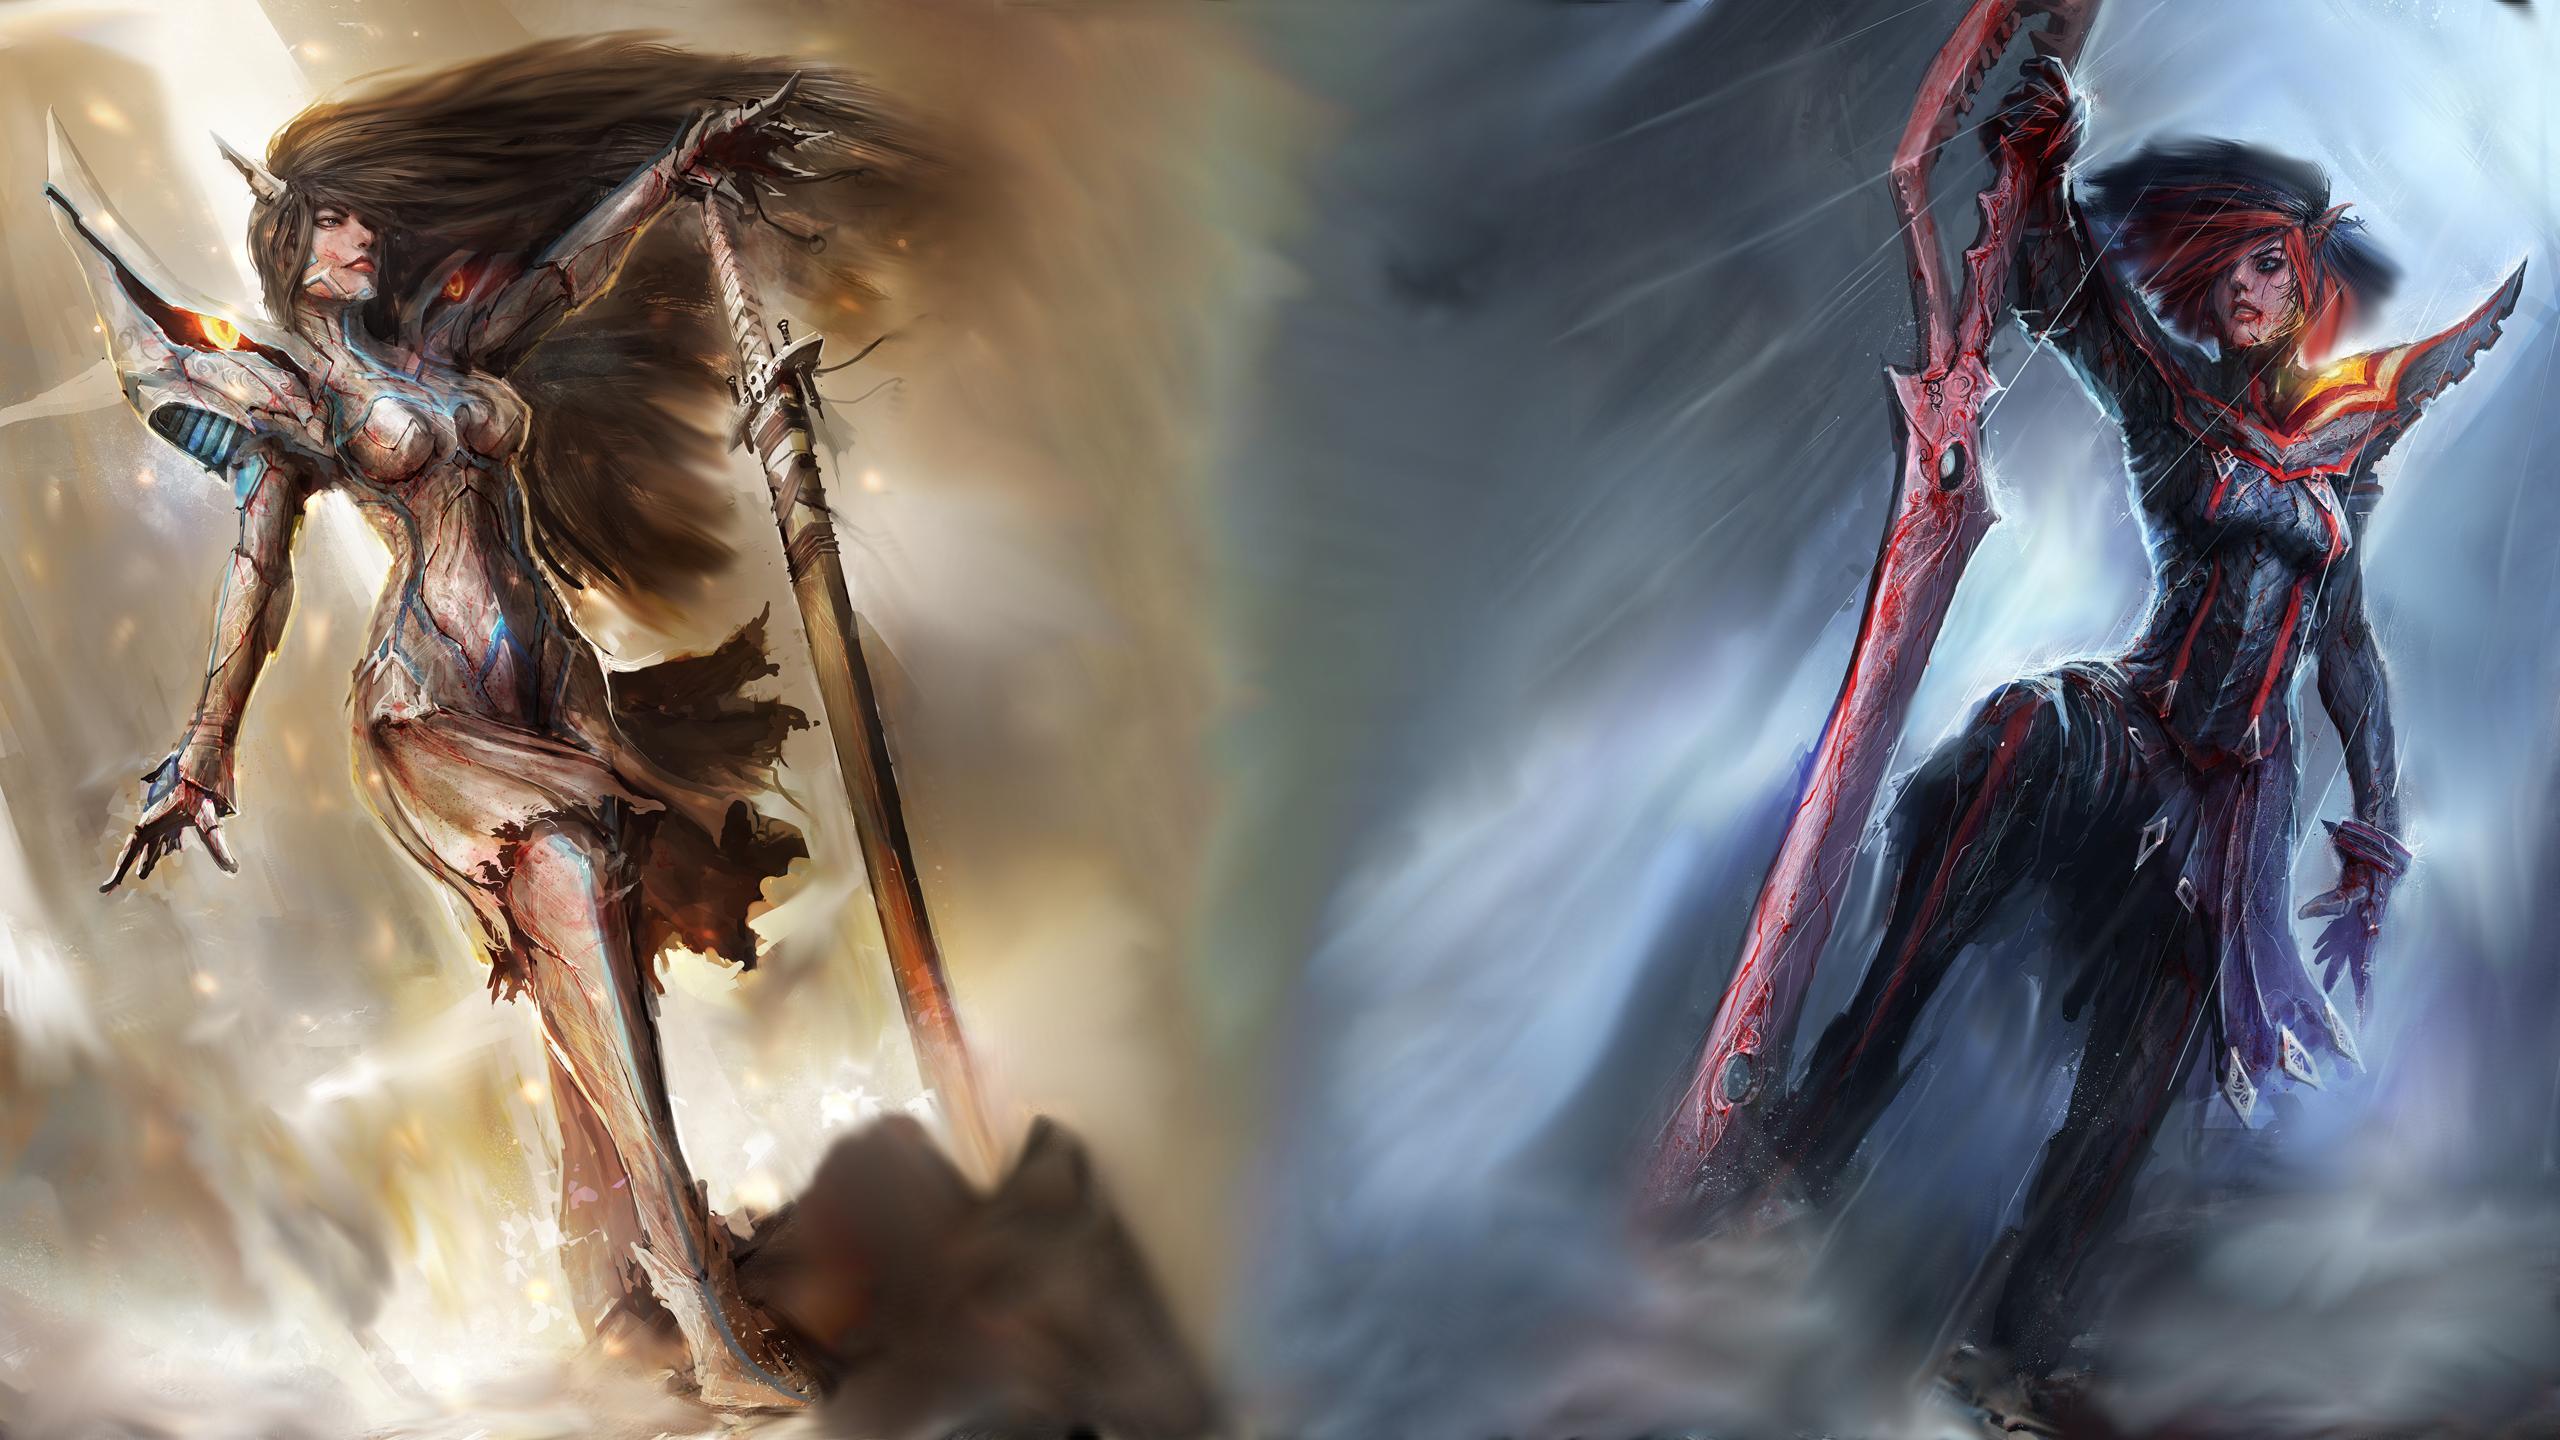 Kill la kill full hd wallpaper and background image - Fanart anime wallpaper ...